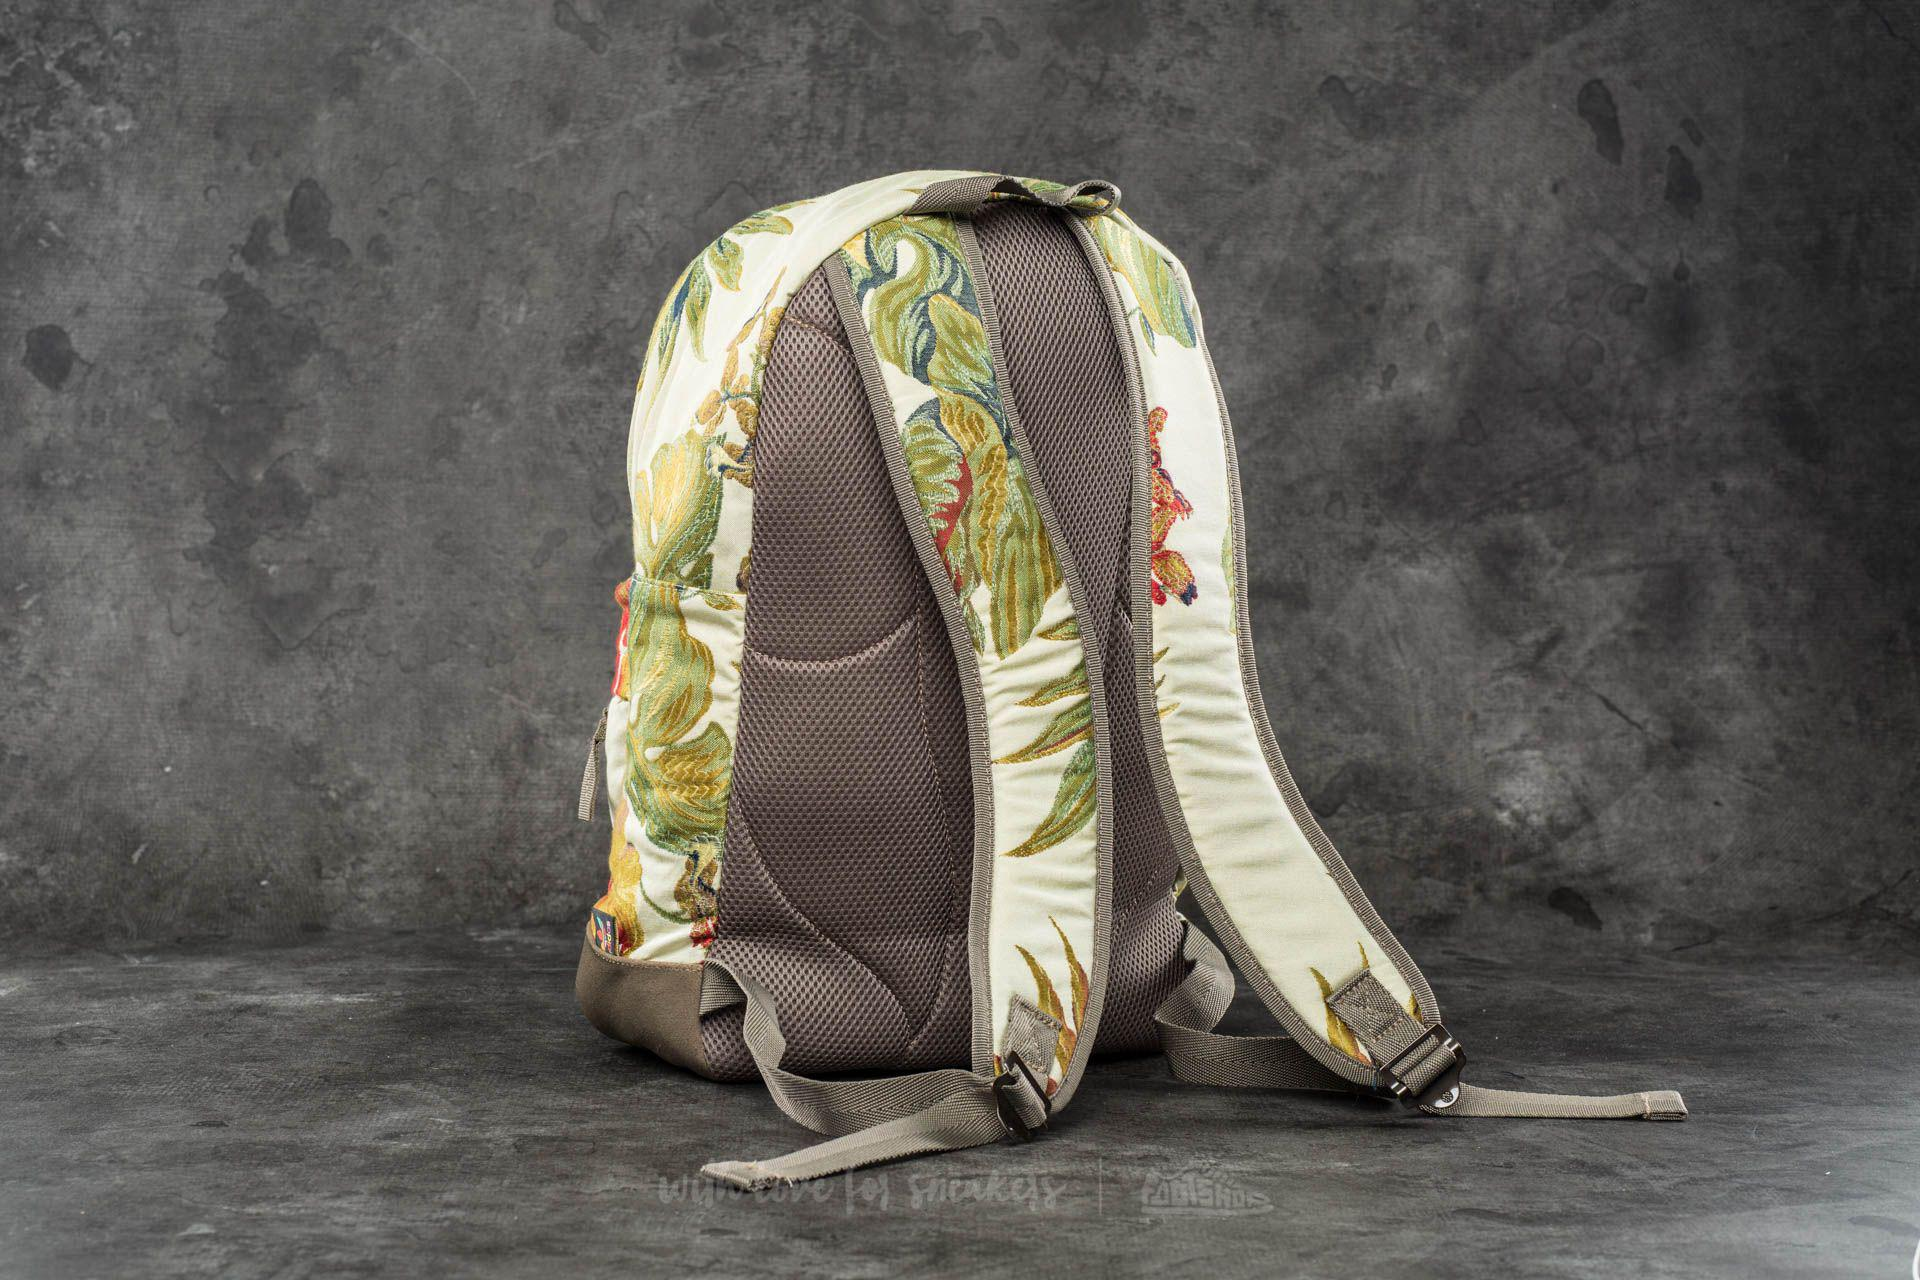 Lyst - adidas Originals Adidas Pharrell Williams Jacquard Backpack ... 04d314700b